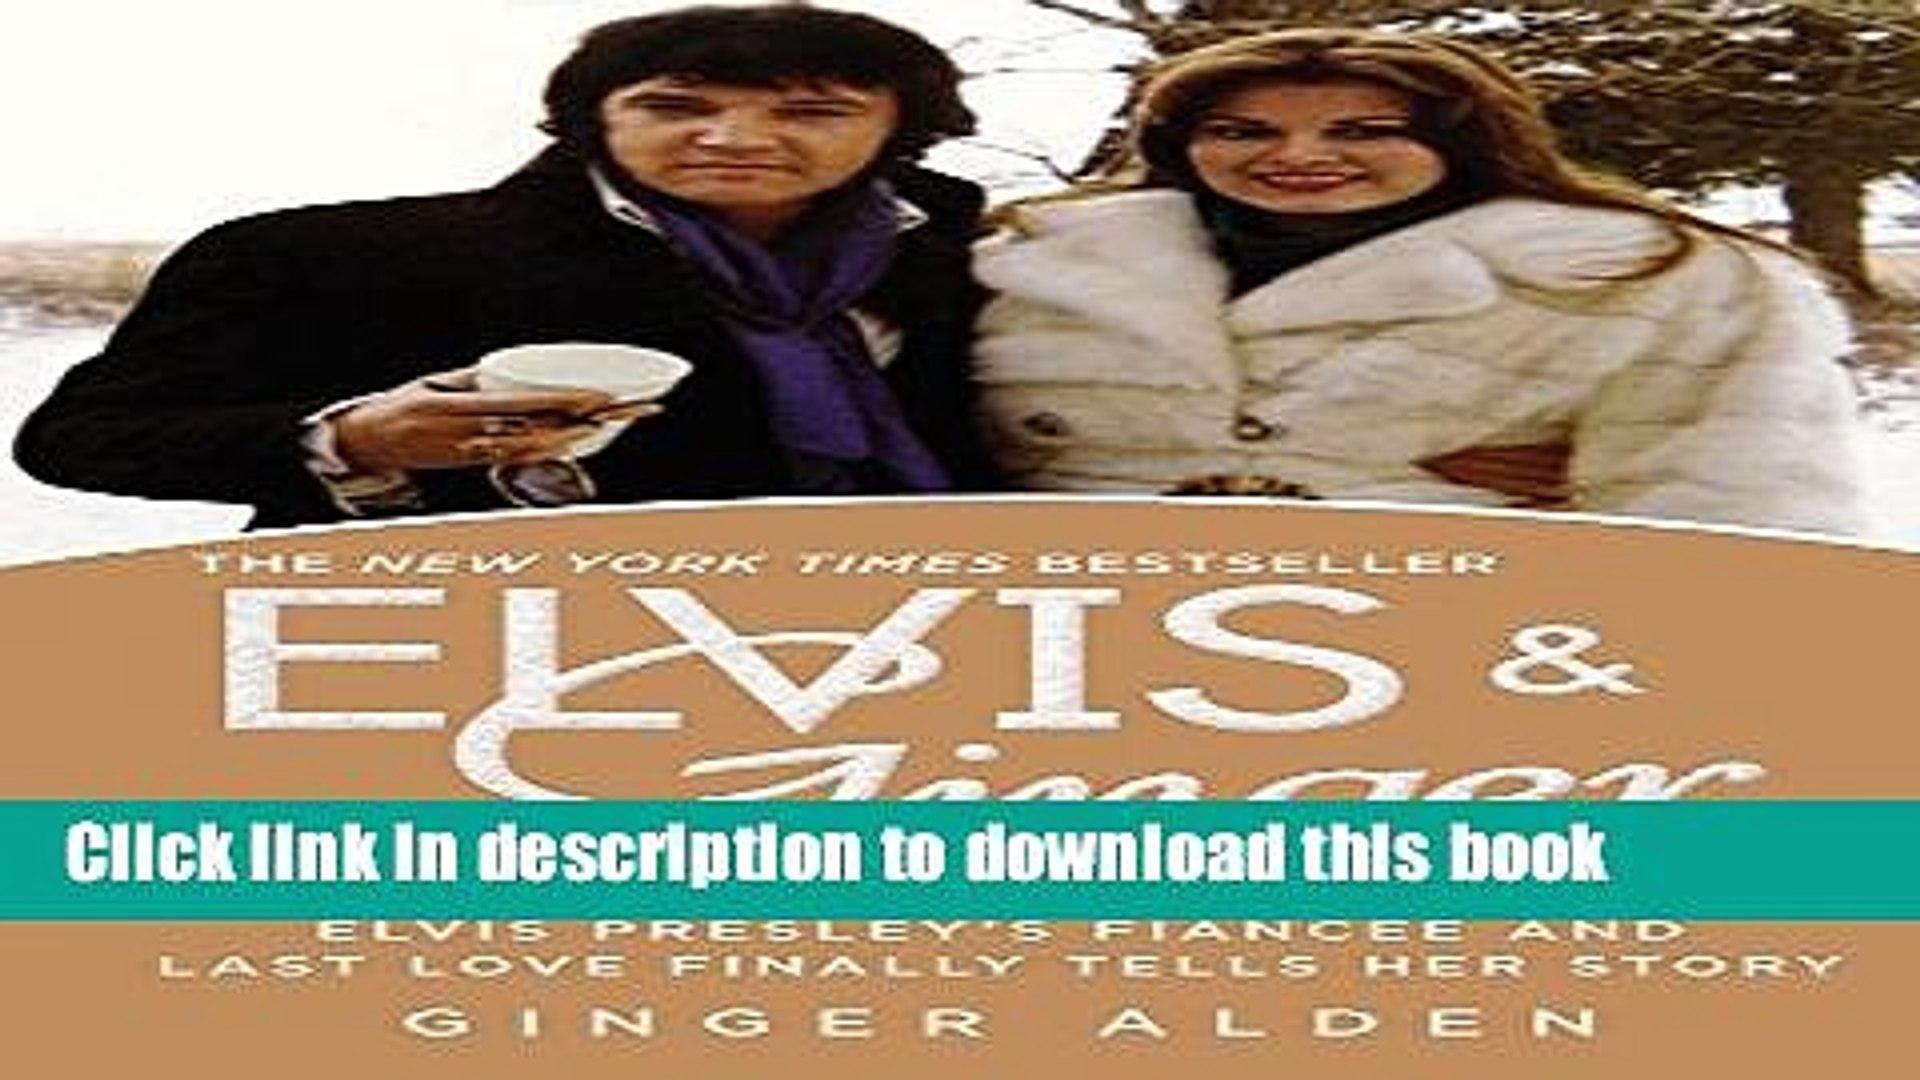 [PDF] Elvis and Ginger: Elvis Presley s Fiancée and Last Love Finally Tells Her Story Popular